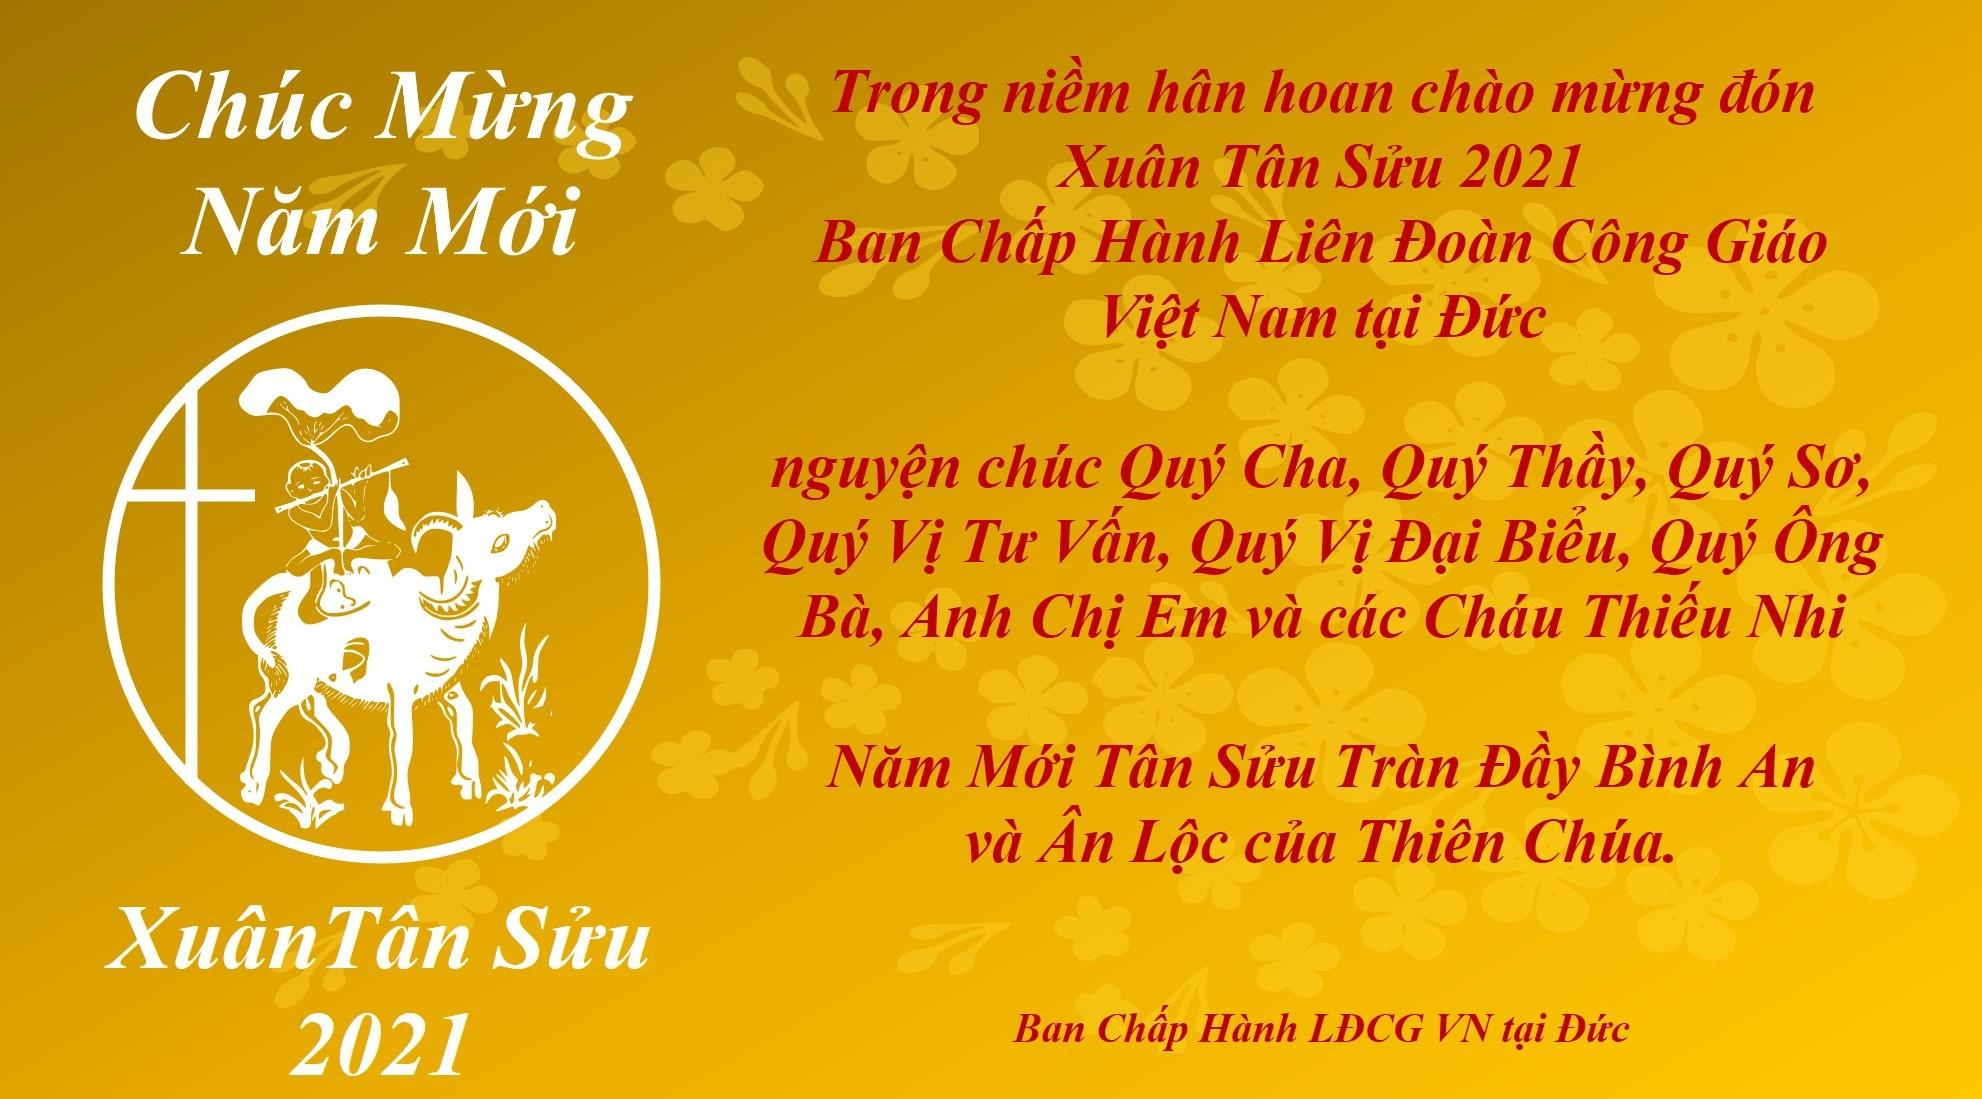 Card Chuc Xuan Tan Suu 1